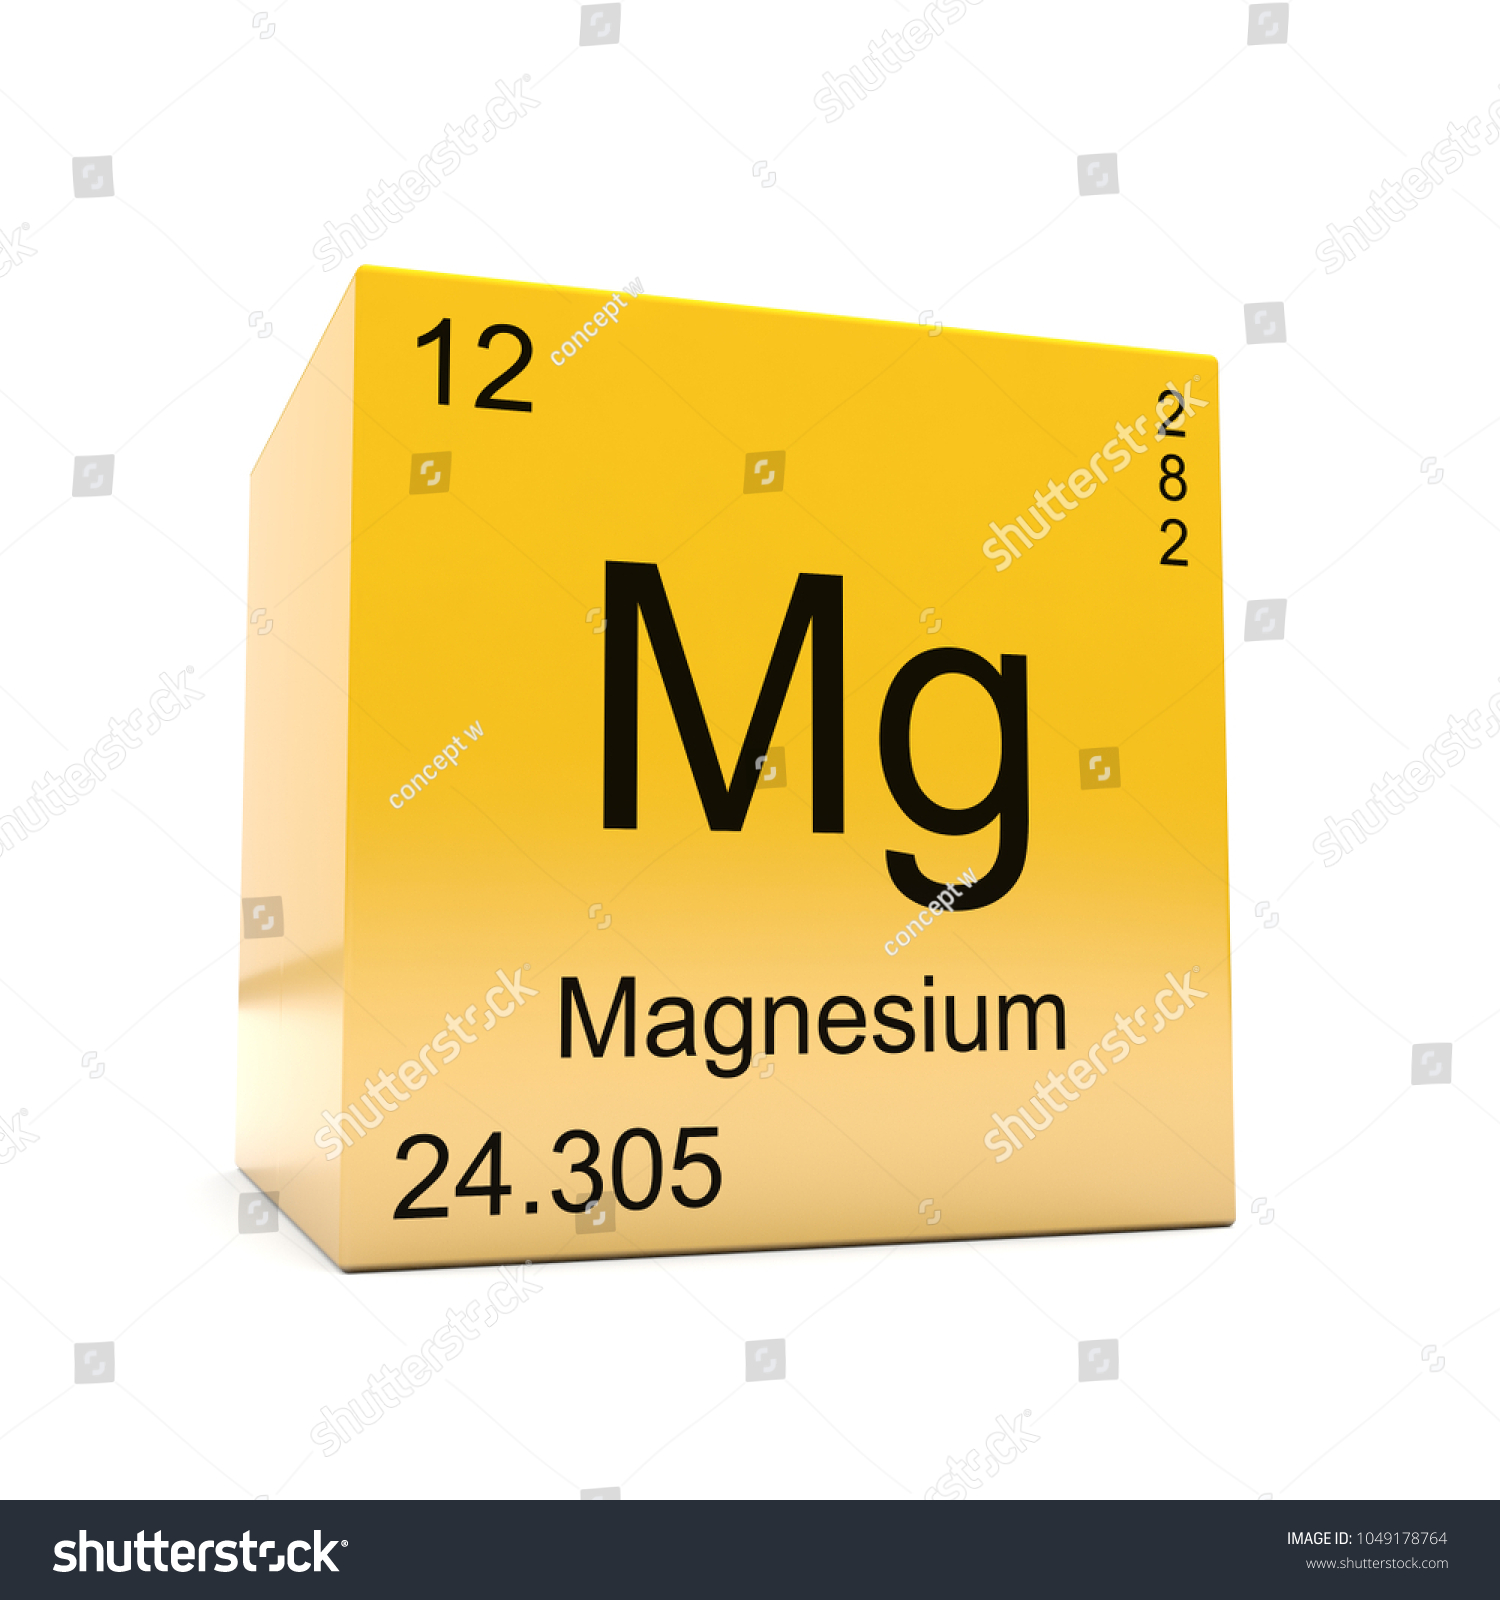 Magnesium chemical element symbol periodic table stock illustration magnesium chemical element symbol from the periodic table displayed on glossy yellow cube 3d render urtaz Gallery